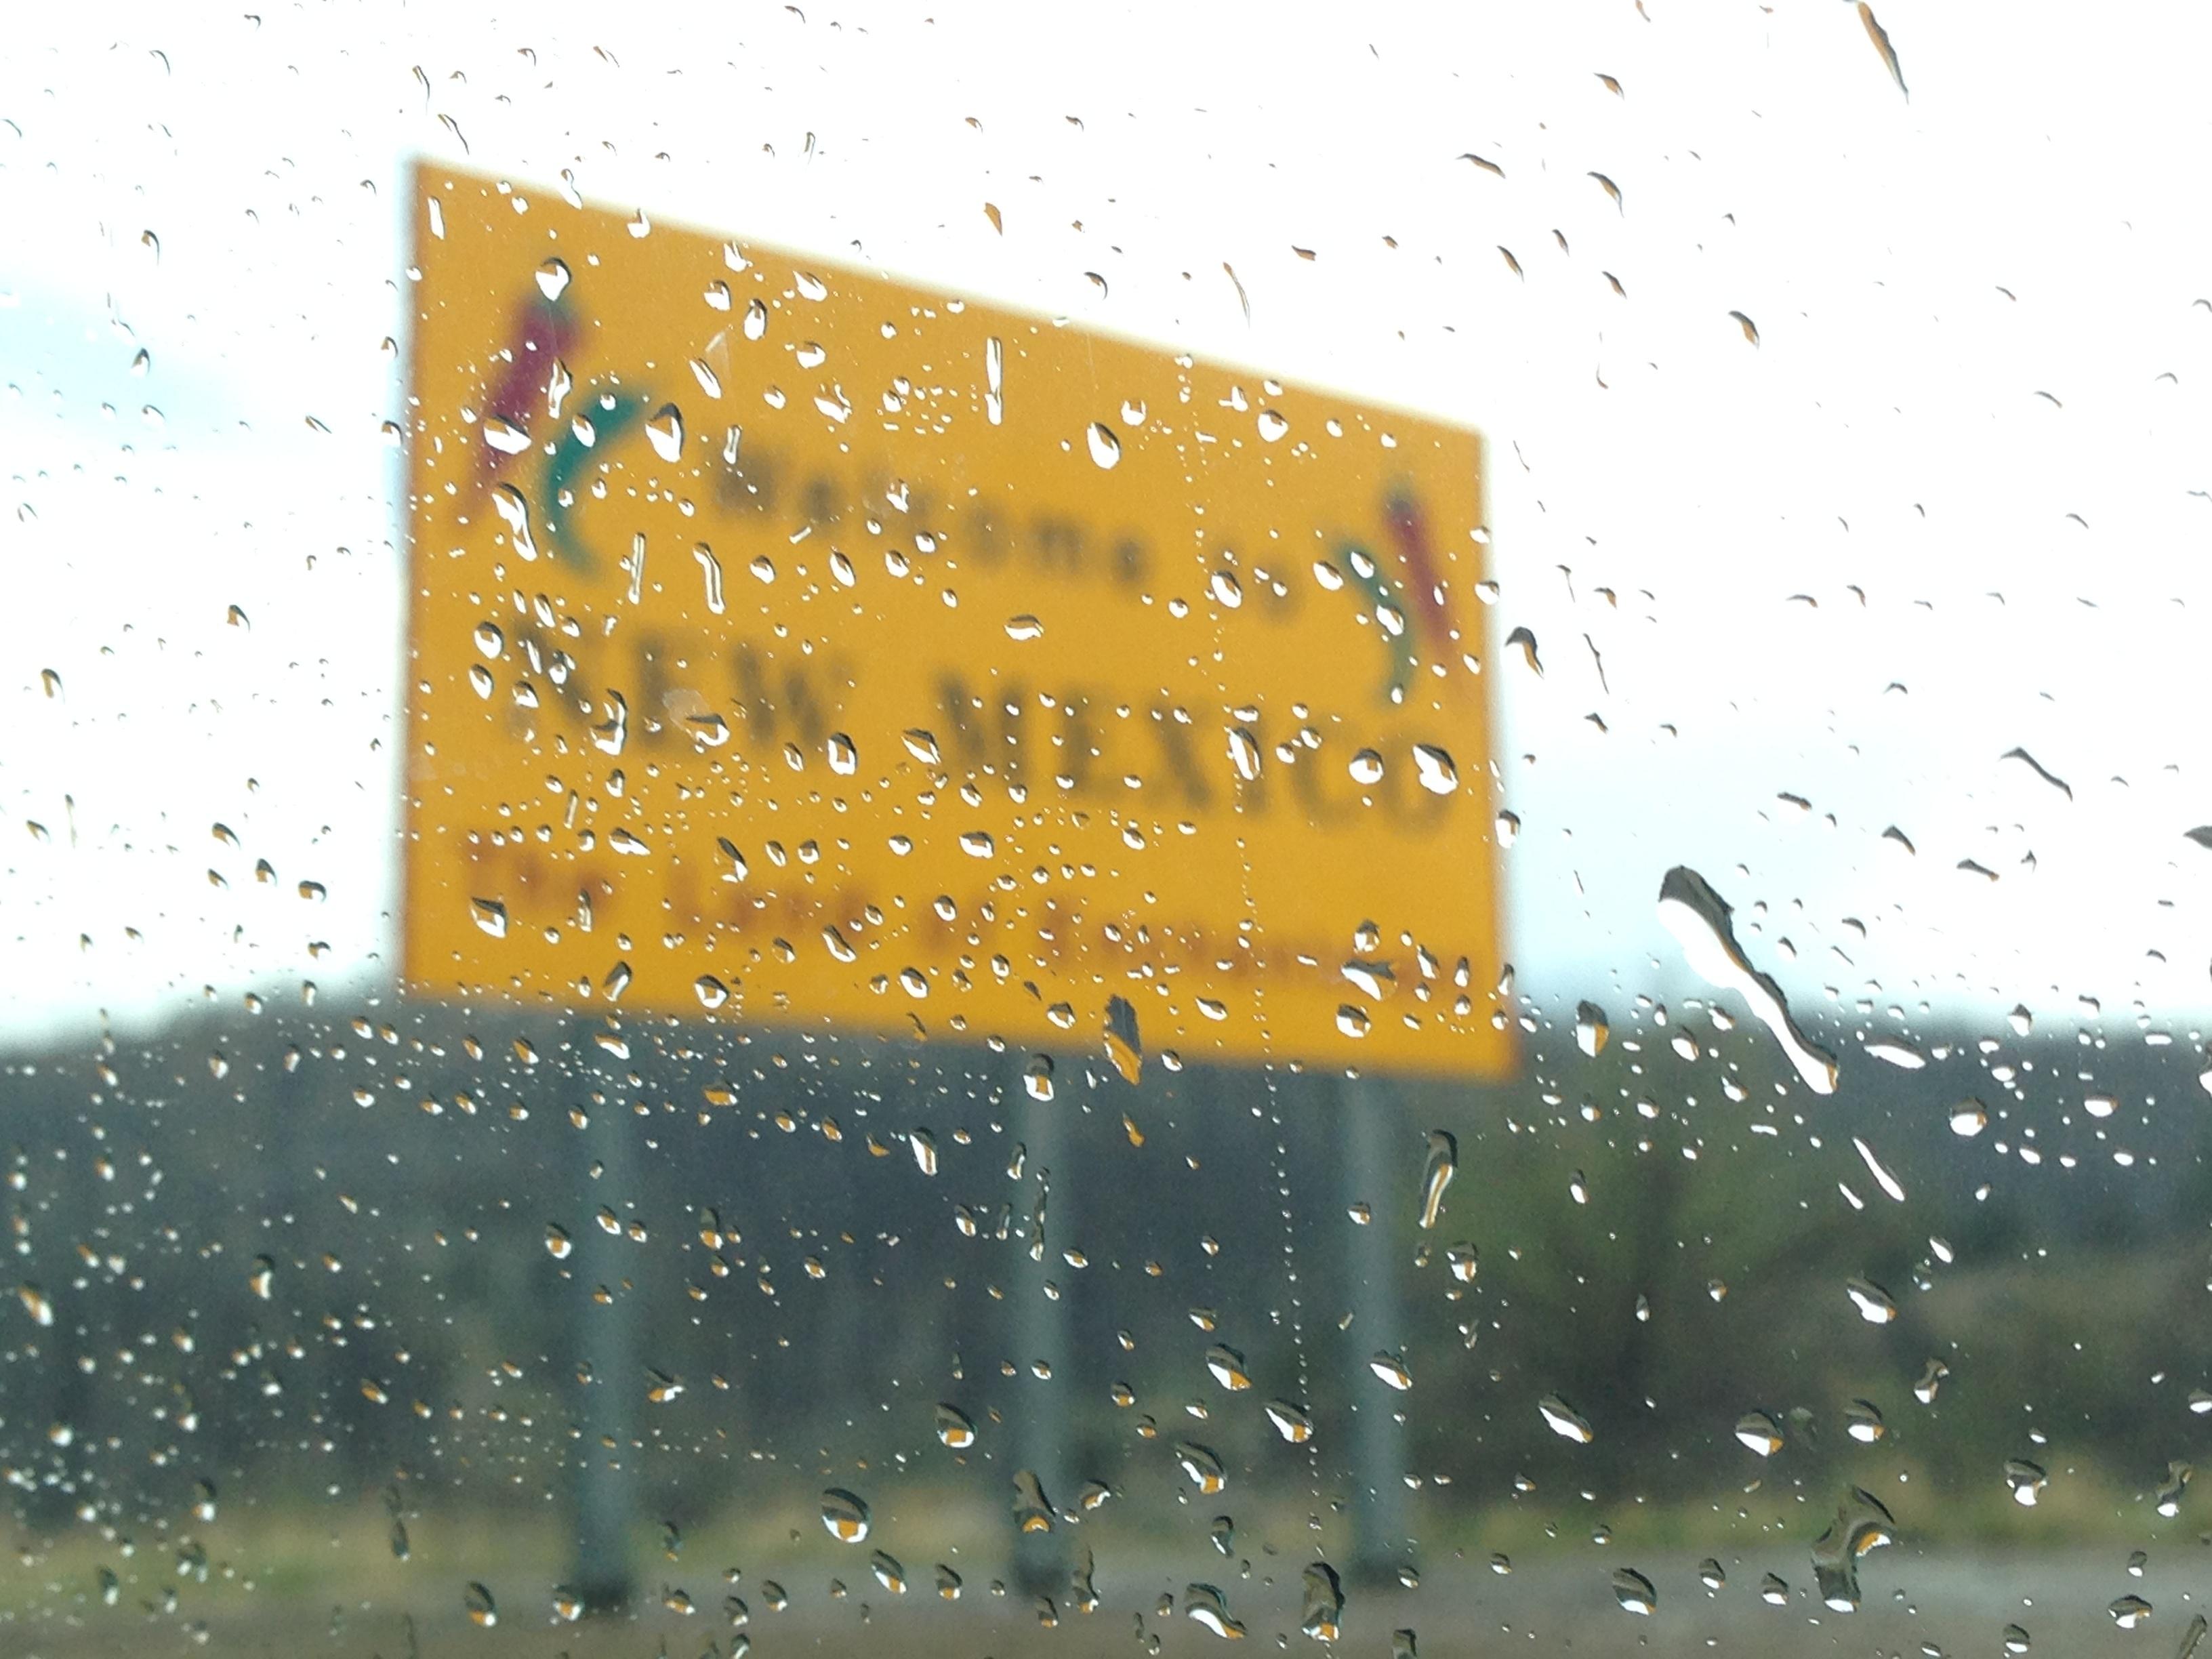 утро дождь шоссе знак Погода США Америка Ориентир Рыжих Туризм Нью-Мексико шрифт текст Добро